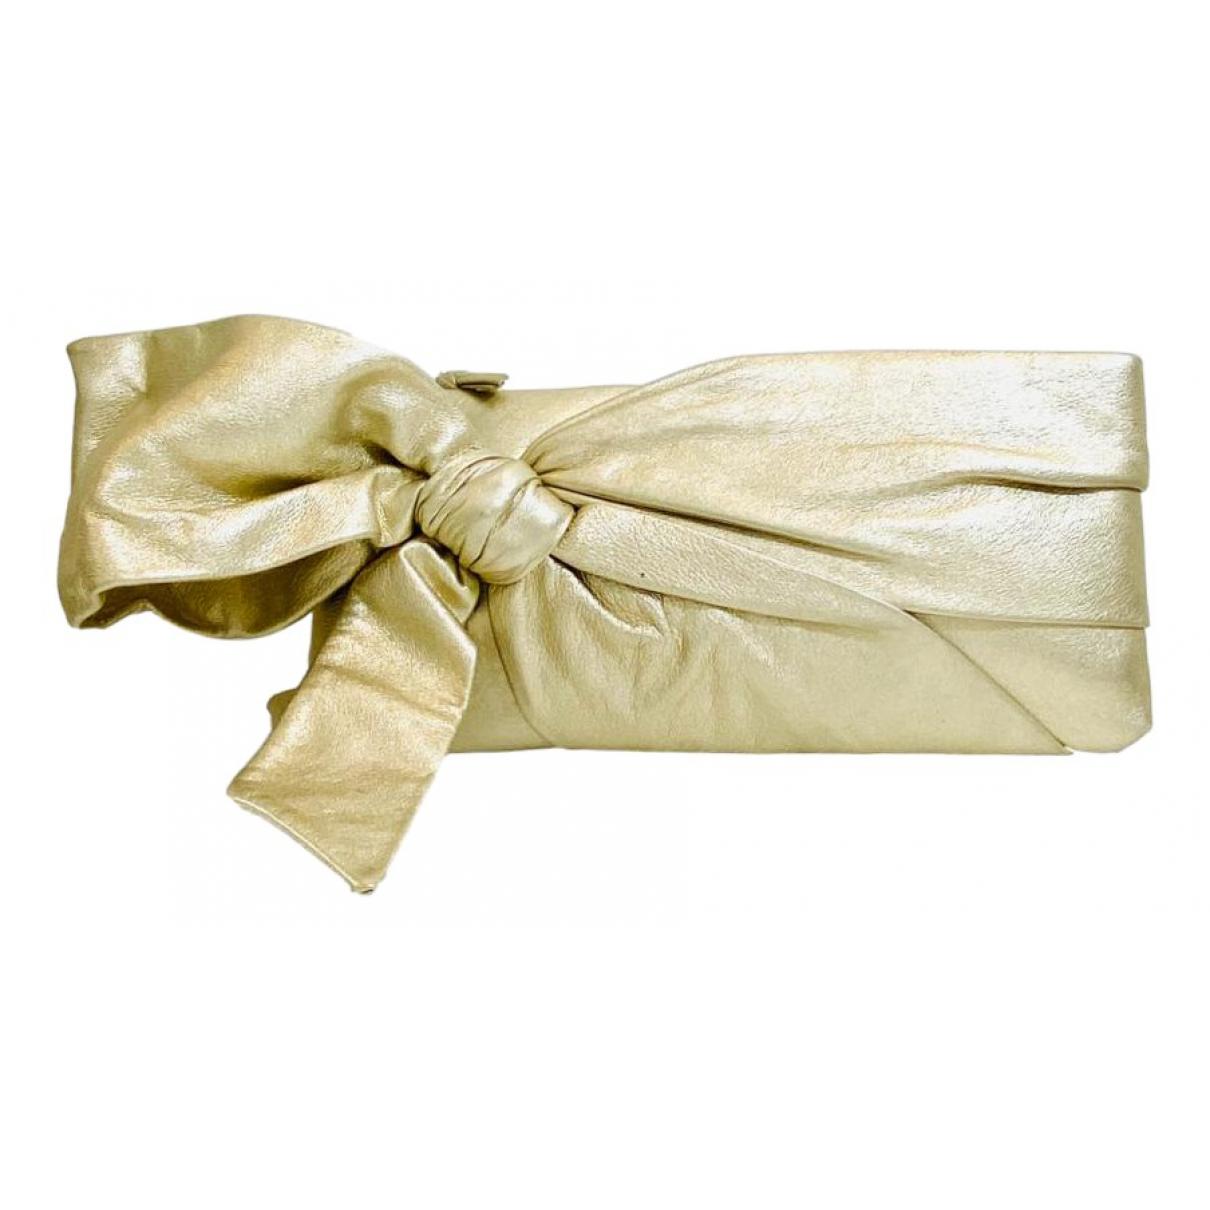 Red Valentino Garavani N Gold Leather Clutch bag for Women N